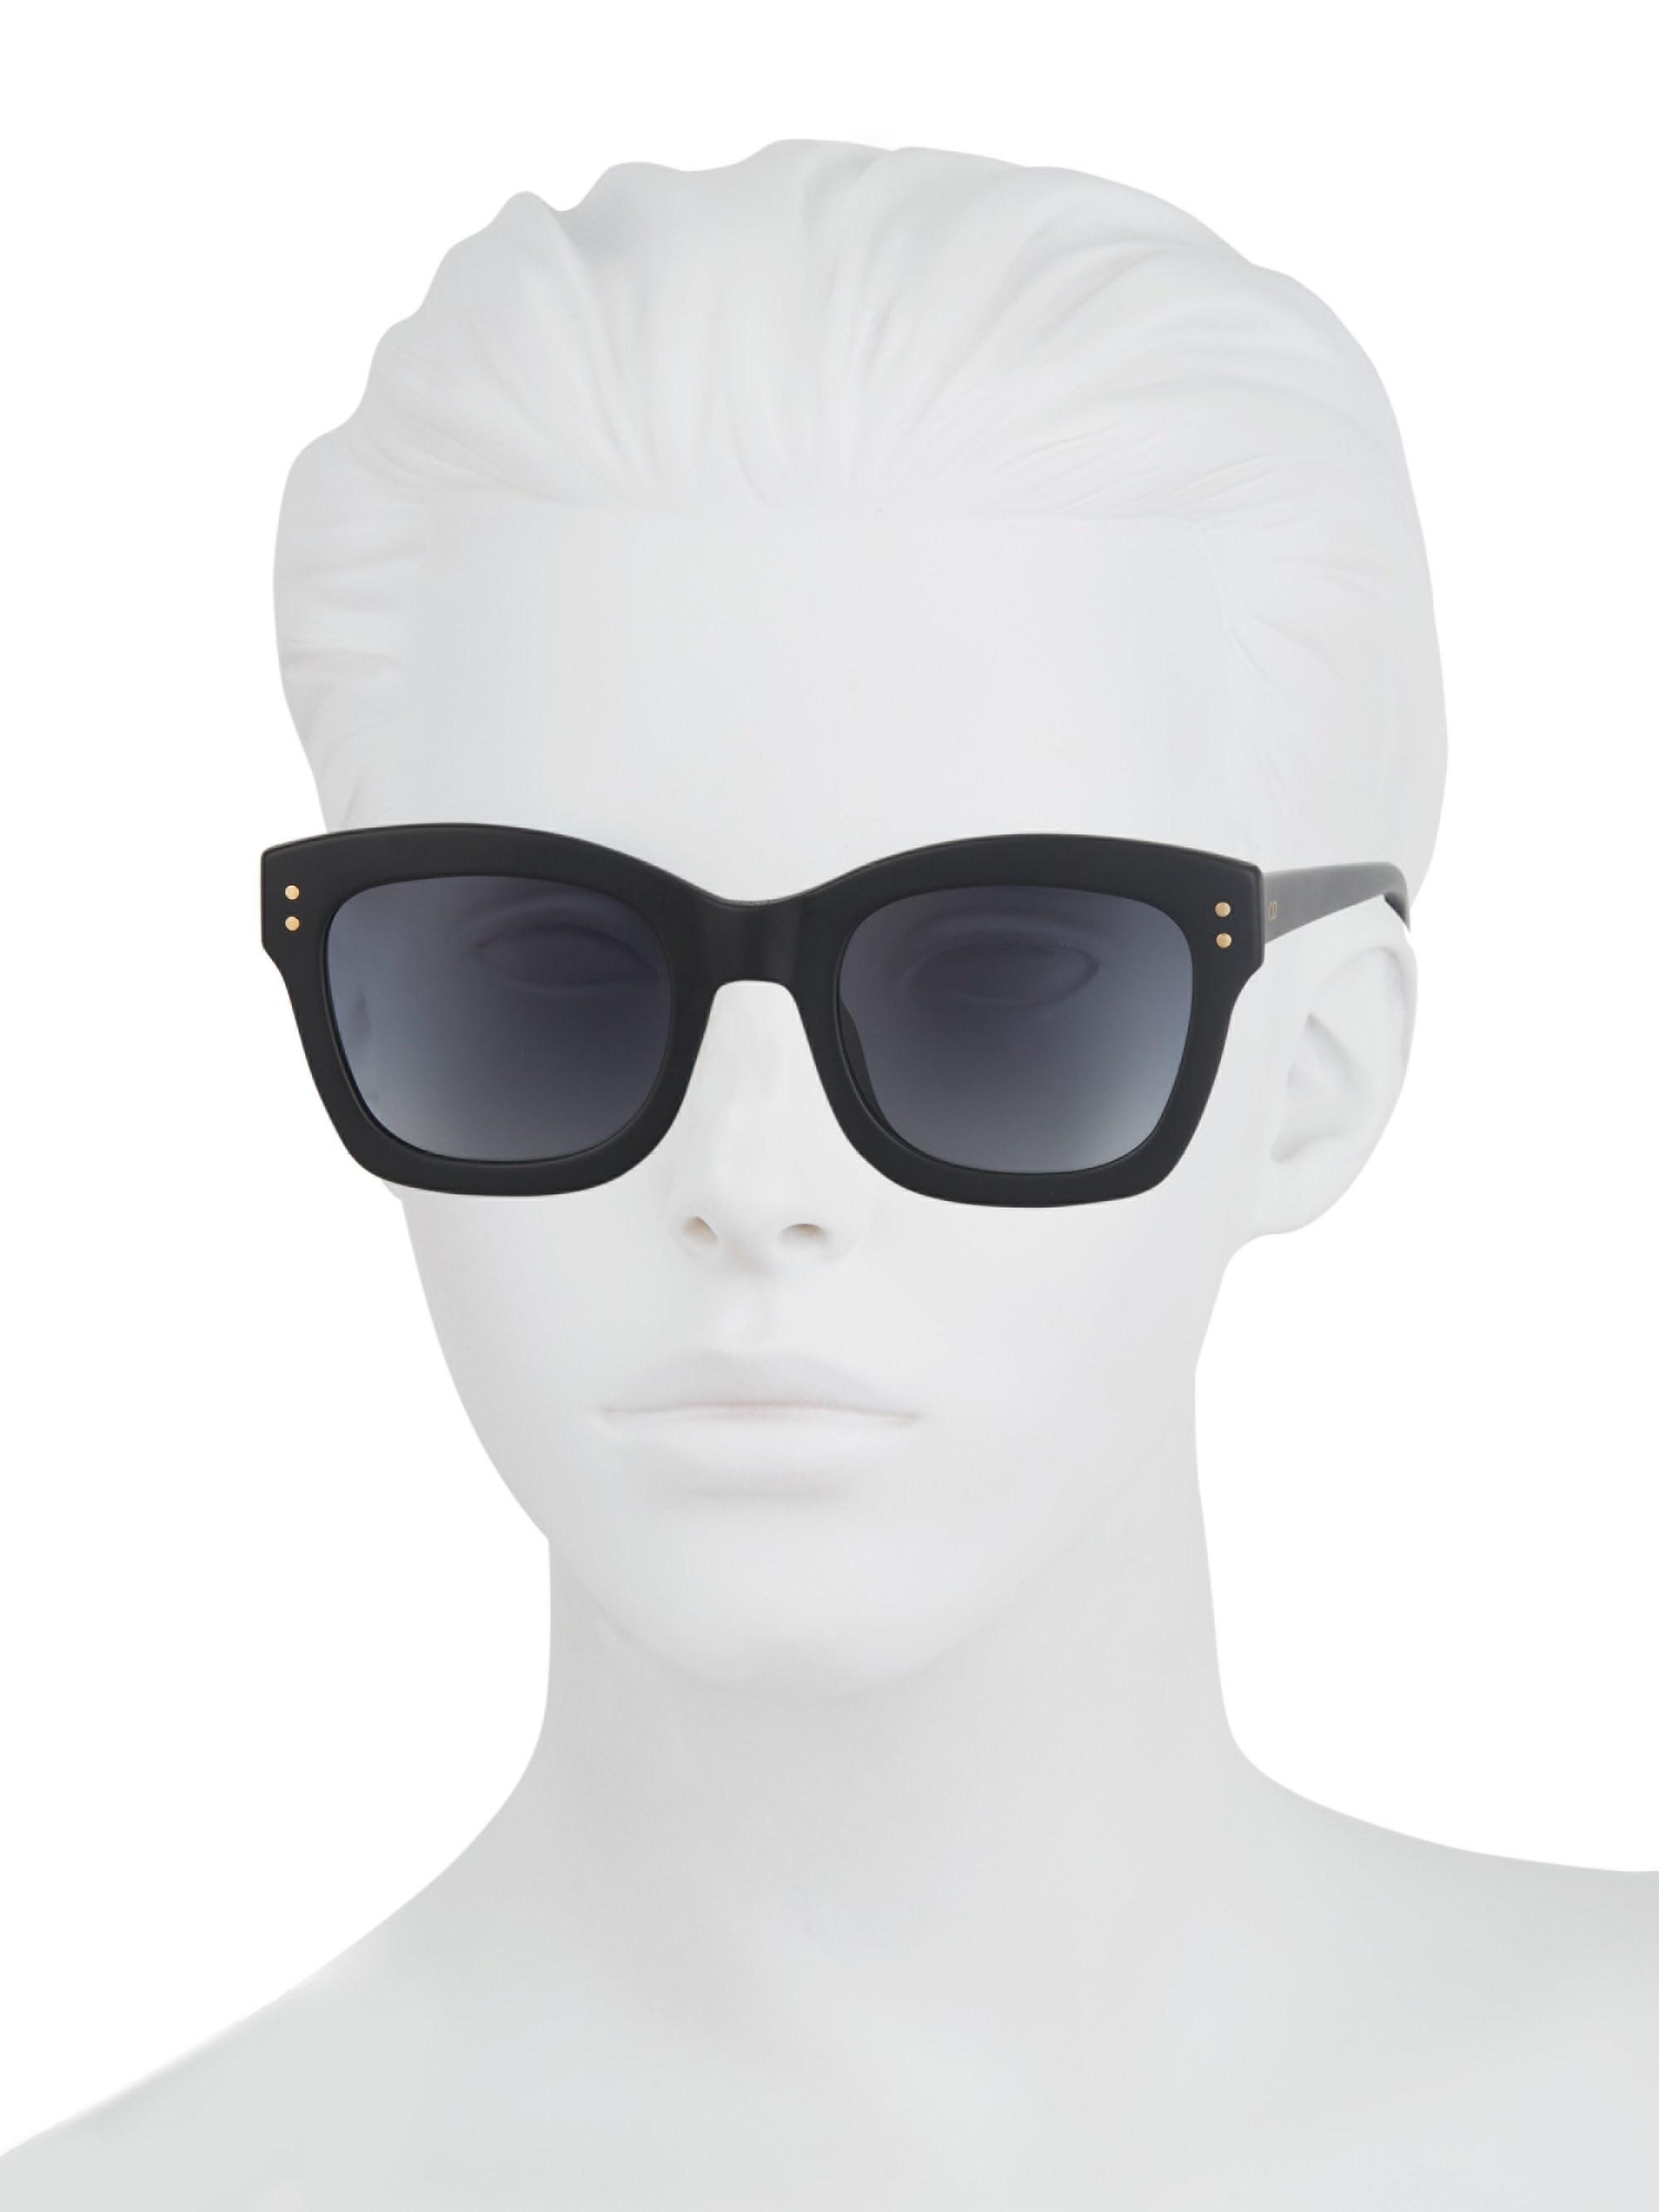 52b148d040bf7 Dior Women s Izon 2 51mm Square Sunglasses - Black in Black - Lyst